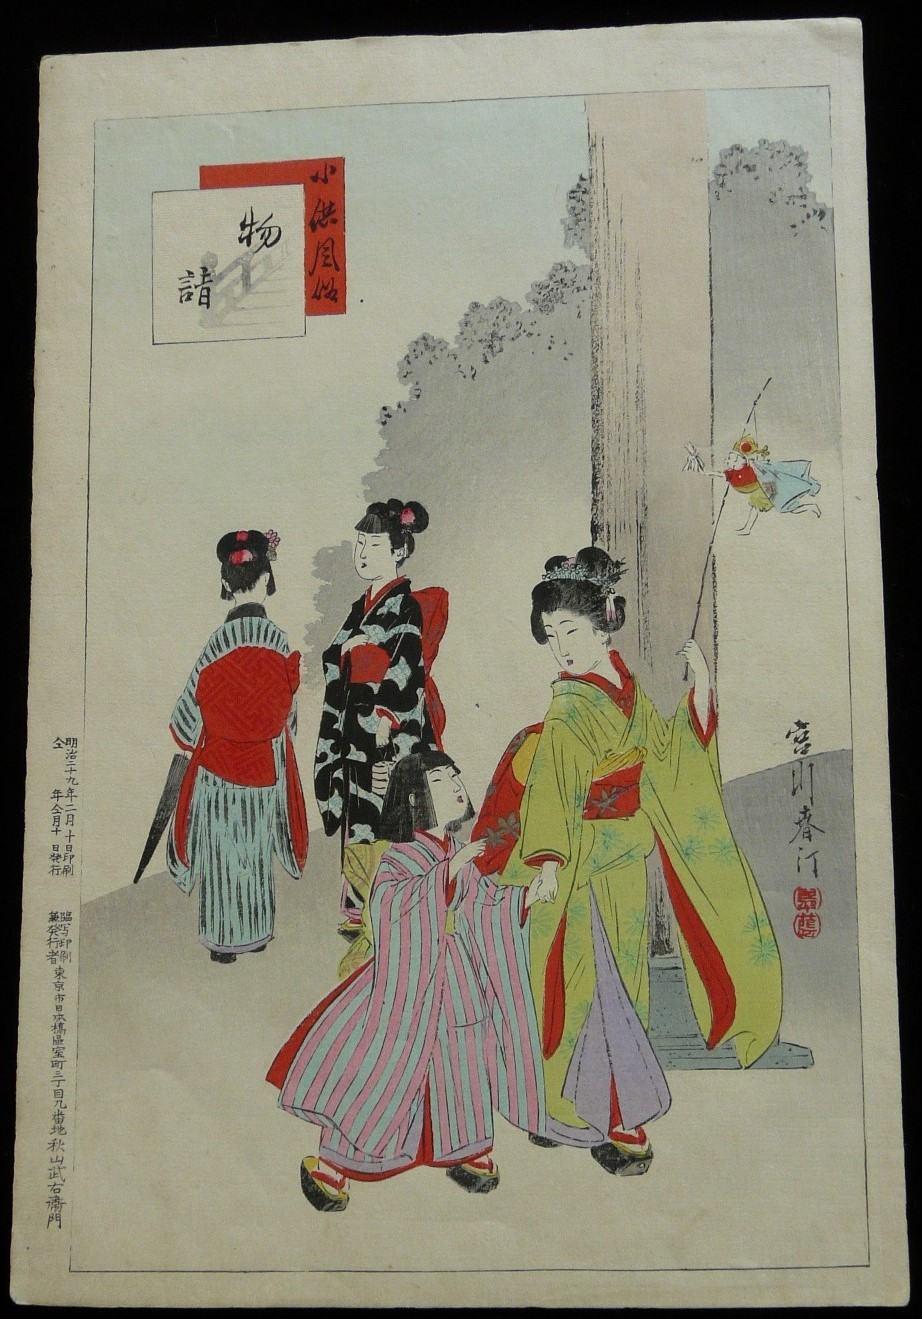 MIYAGAWA SHUNTEI: #P2298 FROM THE SERIES KODOMO FUZOKU - CHILDREN'S REFINEMENTS (1896)